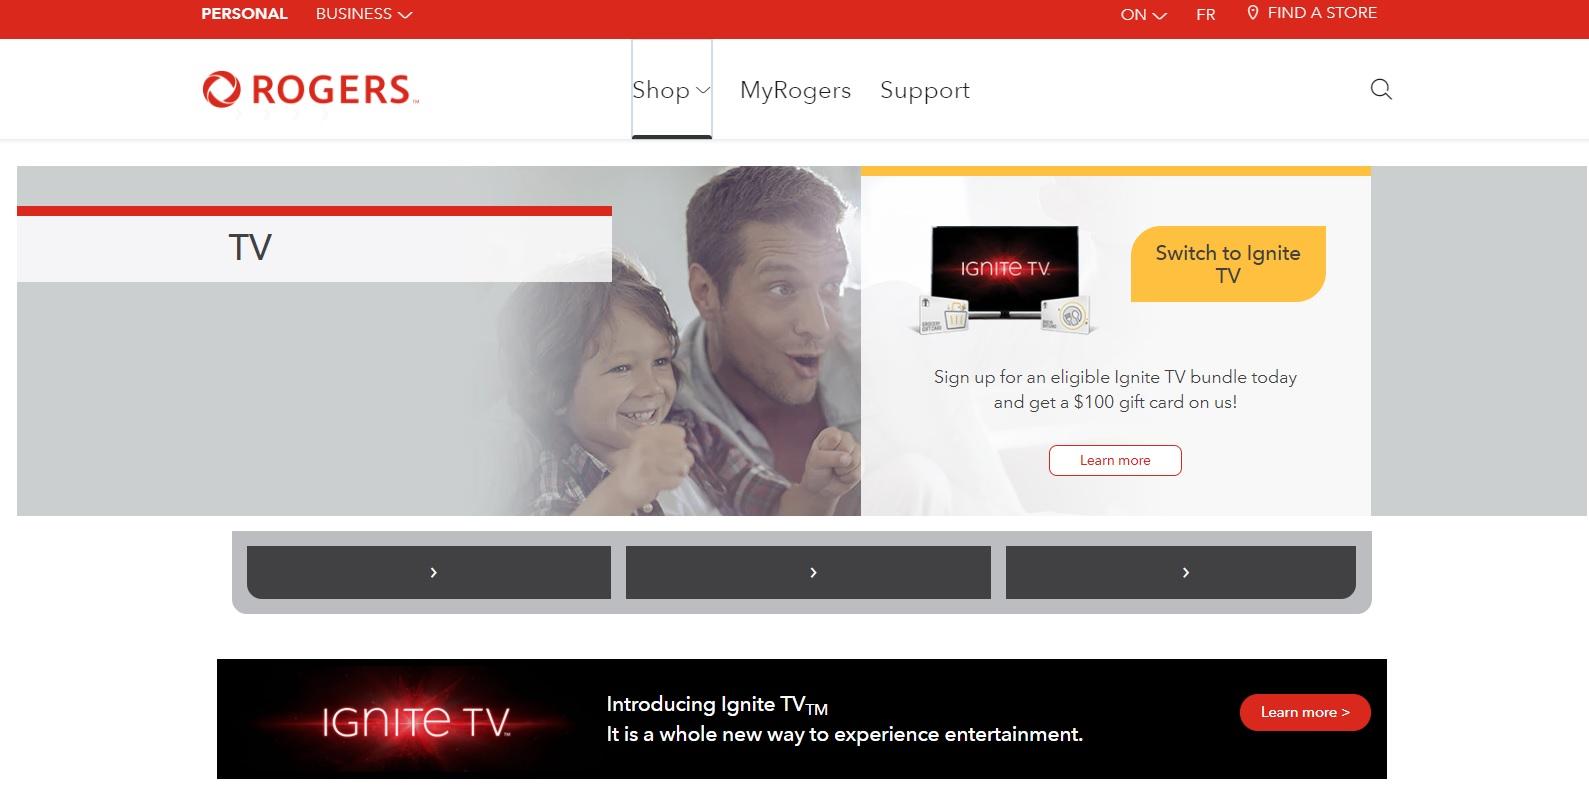 Shop - Rogers screen.jpg